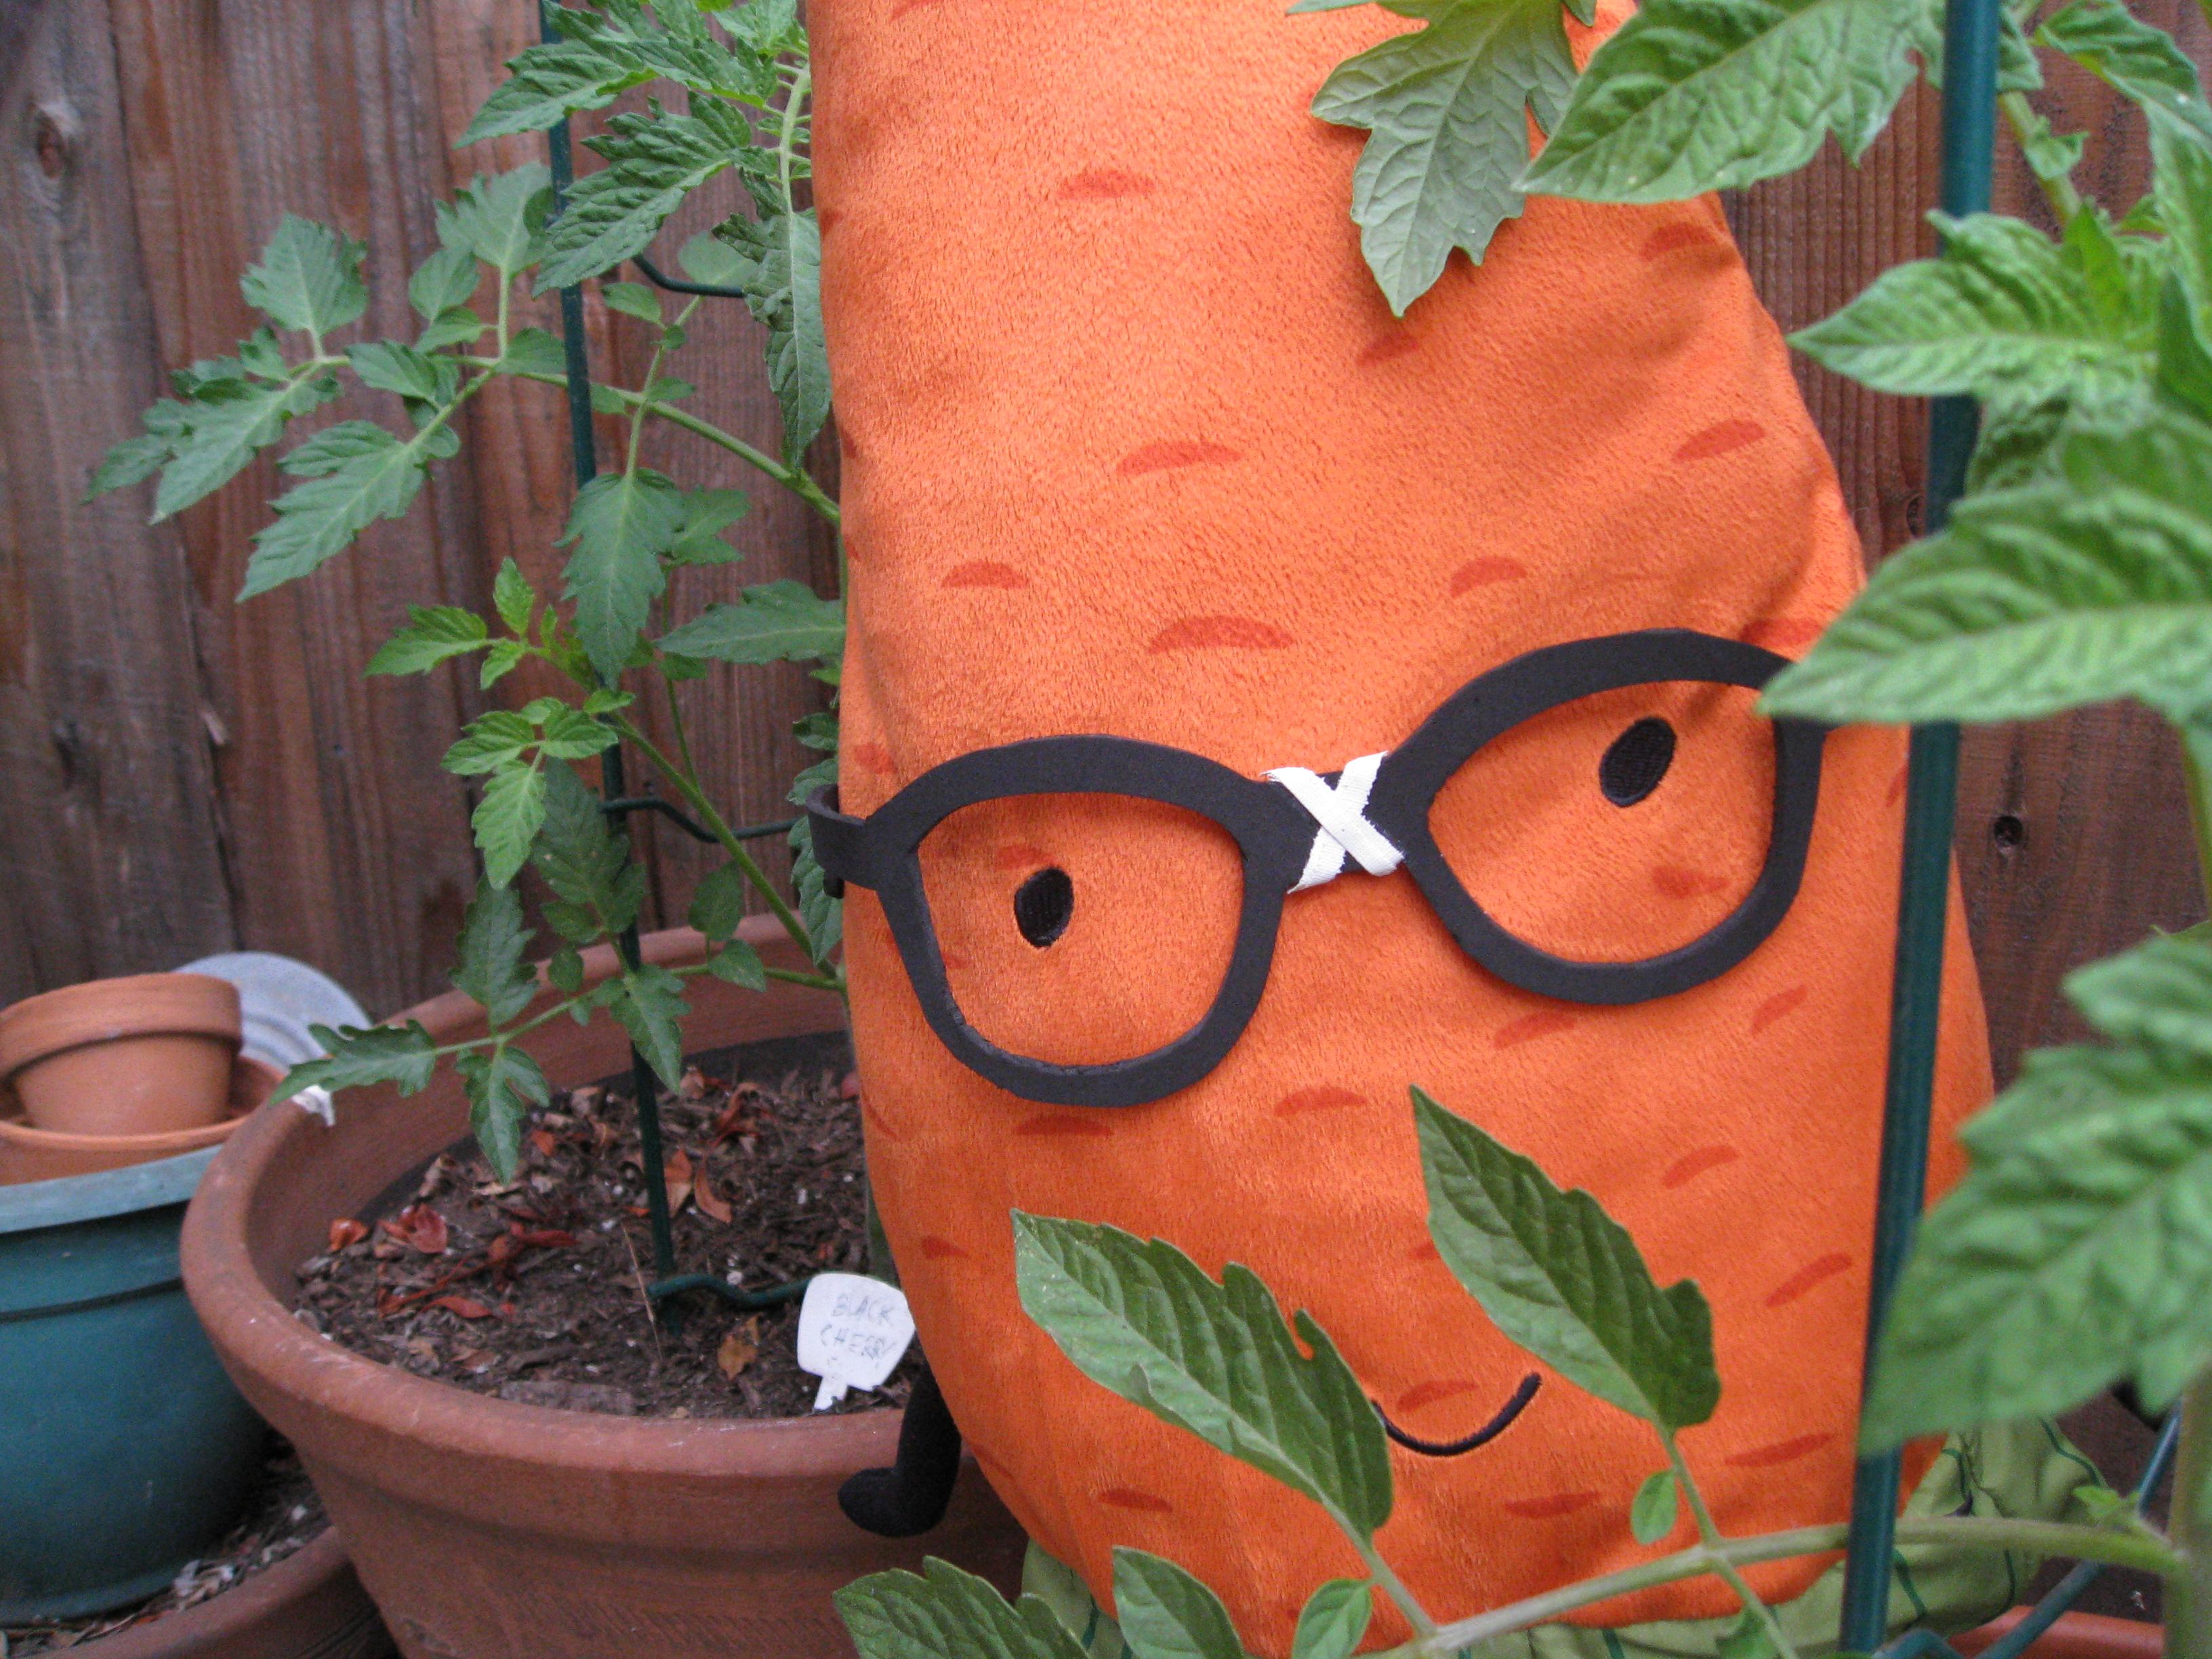 It's tomato season in Los Angeles!